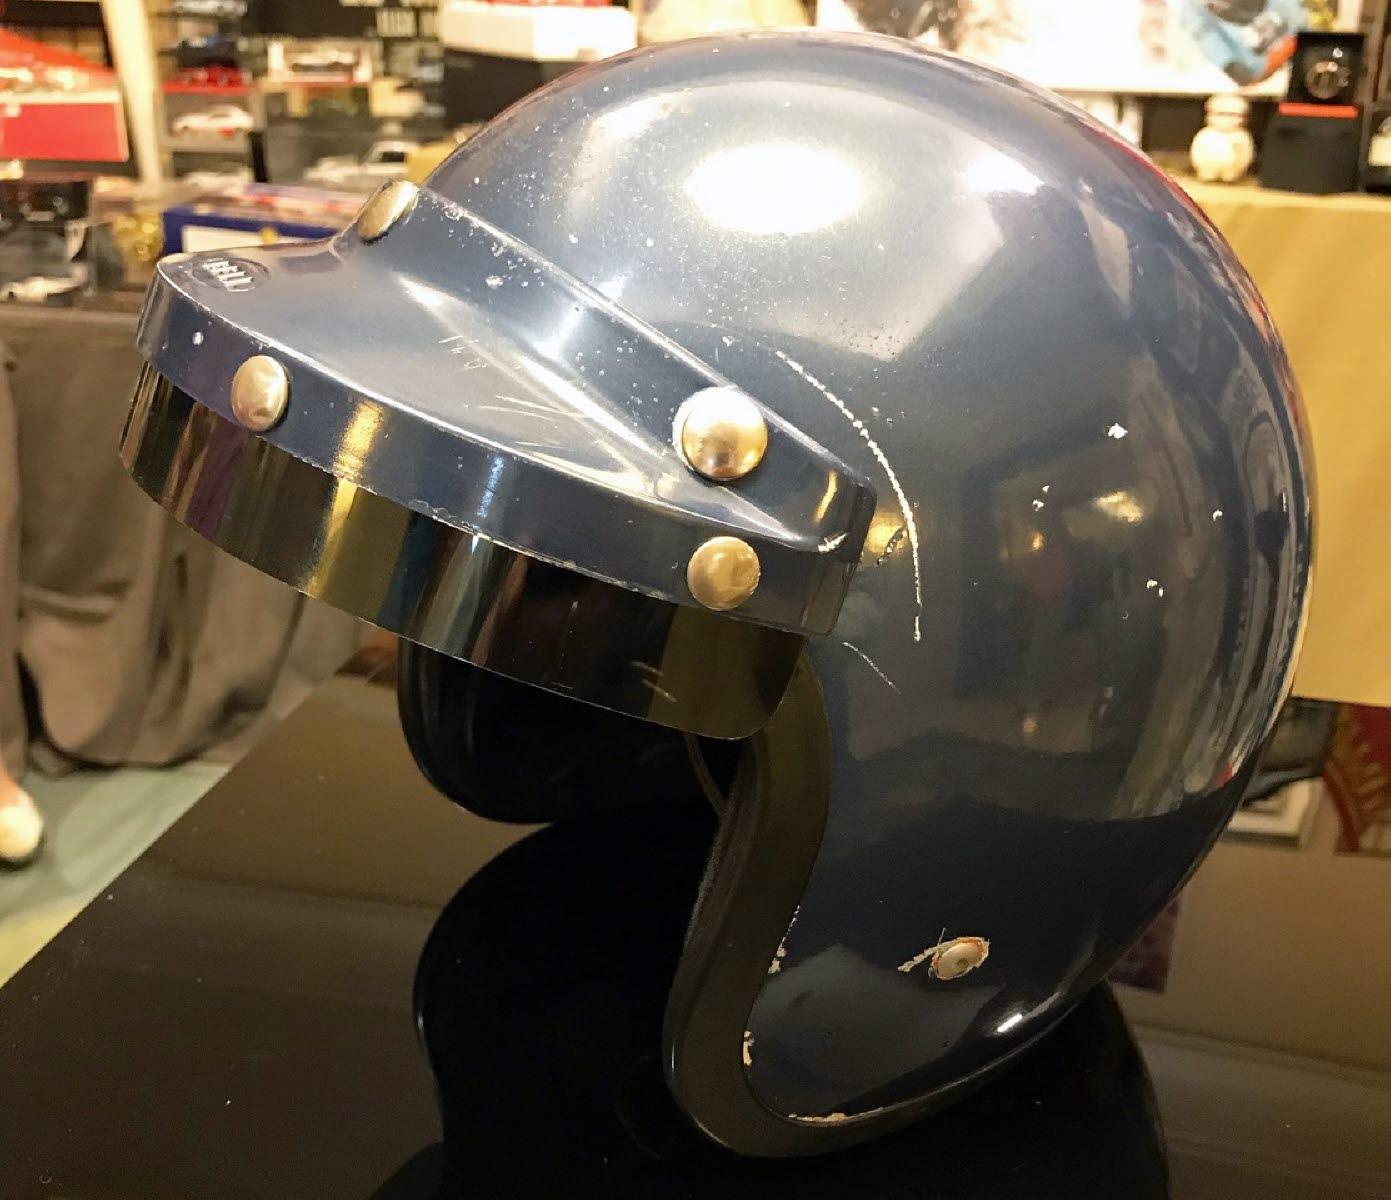 The helmet. [Photo by Jack Webster]